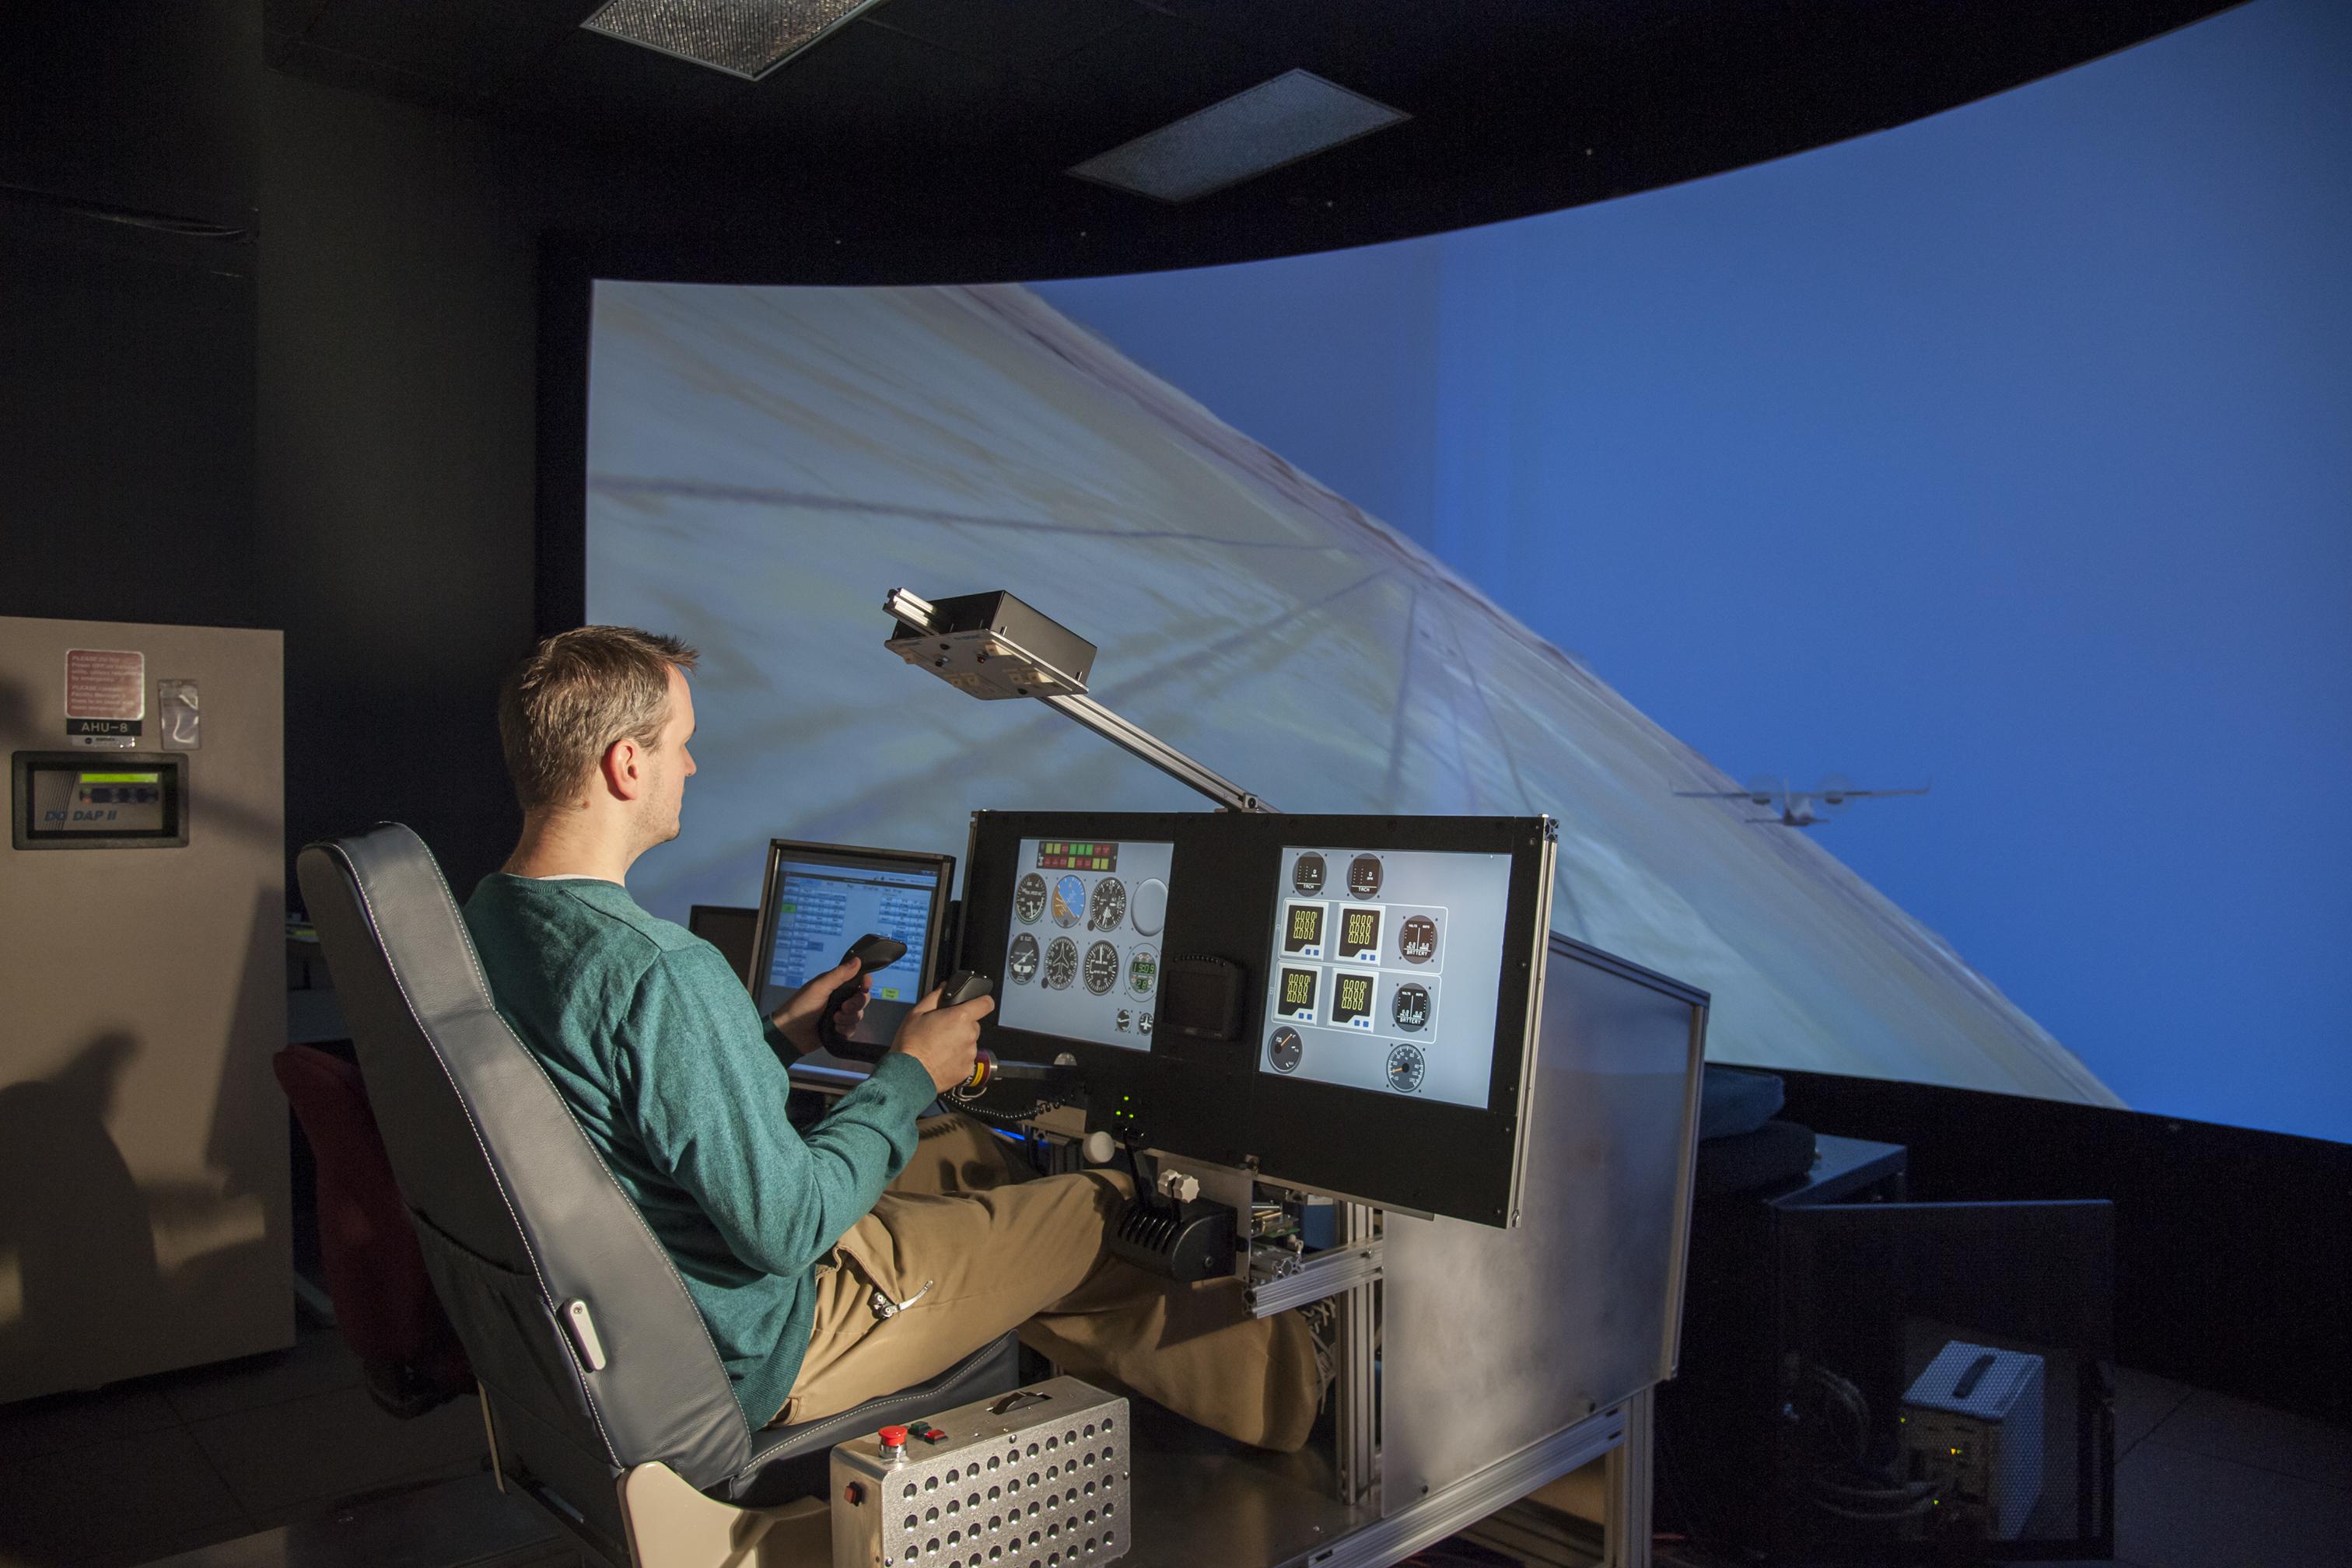 astronaut flight simulator - photo #7